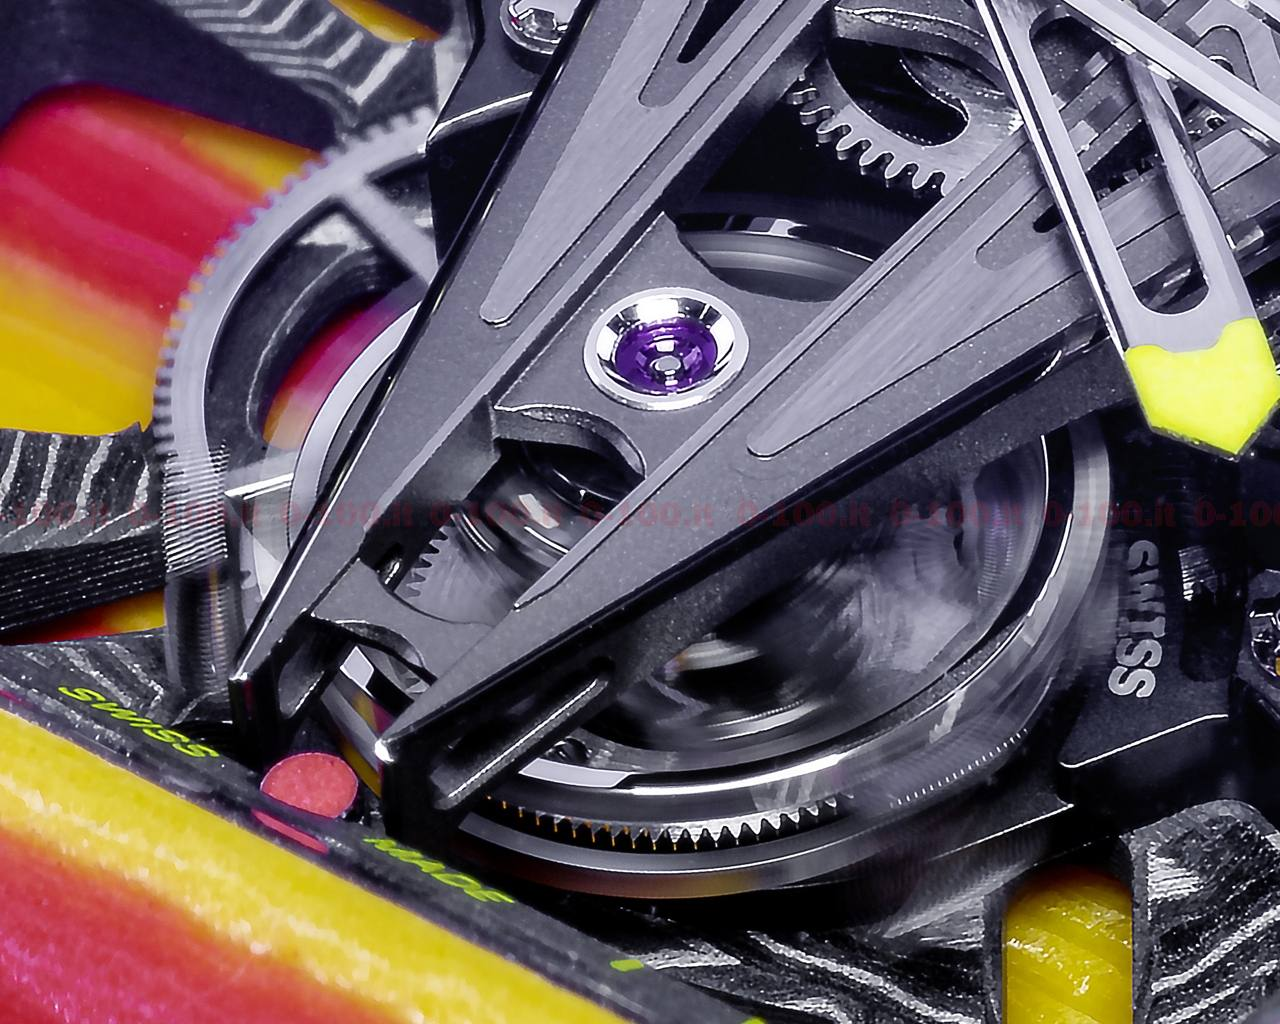 Richard Mille RM 27-03 Limited Edition_prezzo_price_0-1009